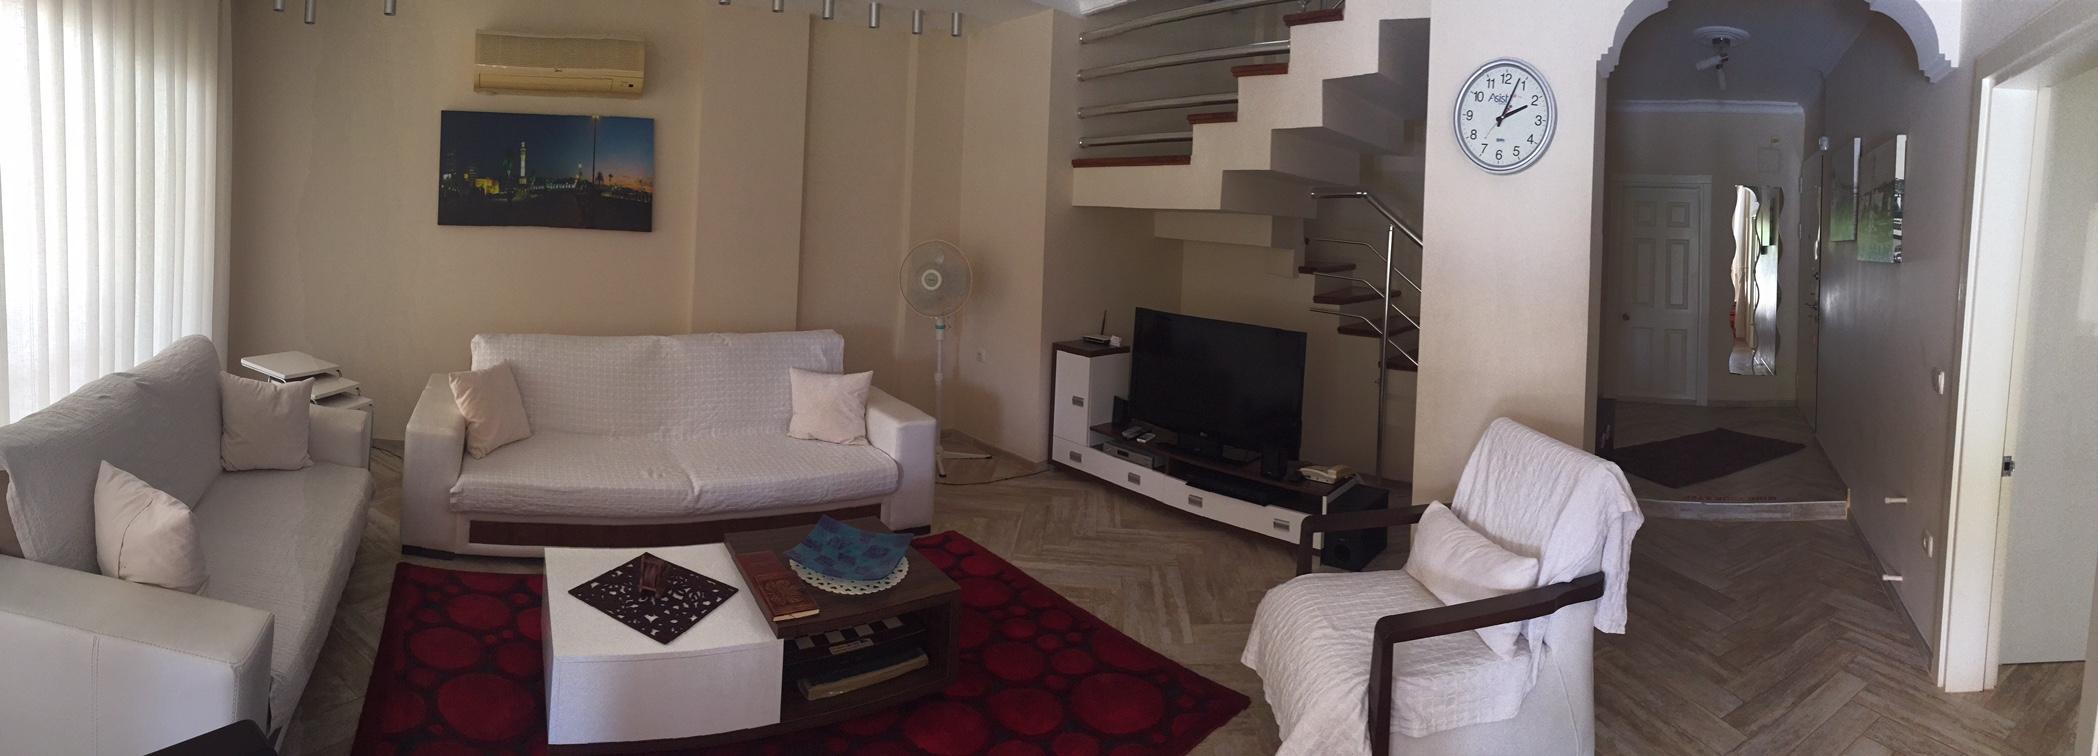 Livingroom_Panaromic.JPG